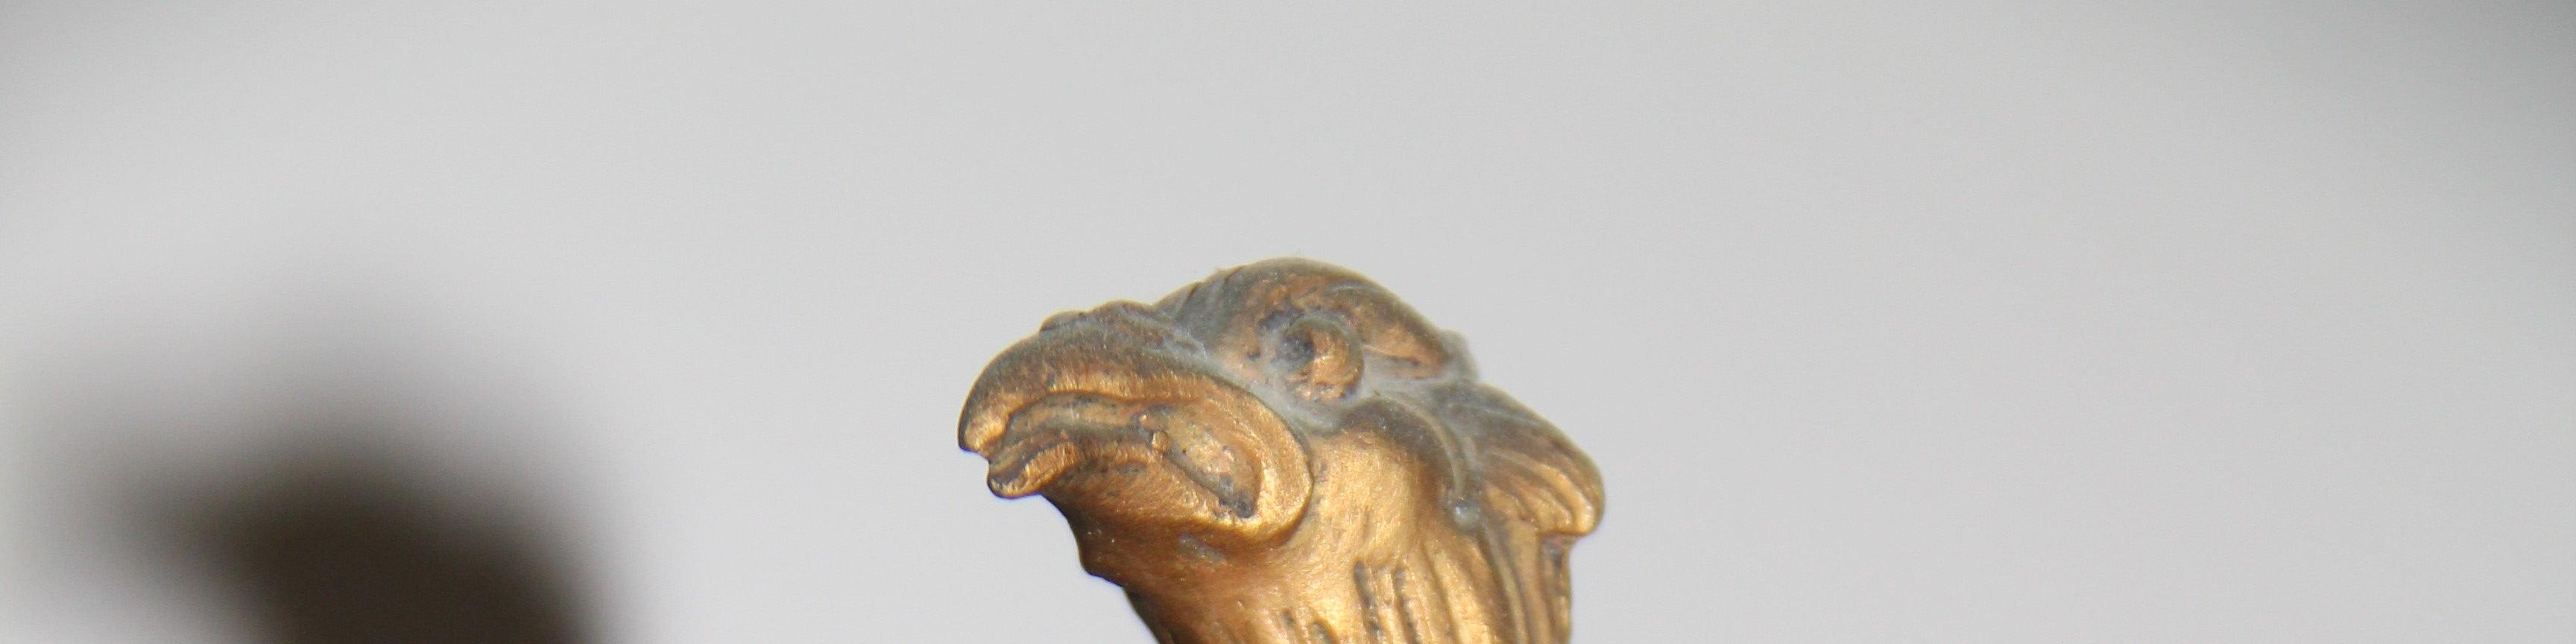 Antichita Fasano